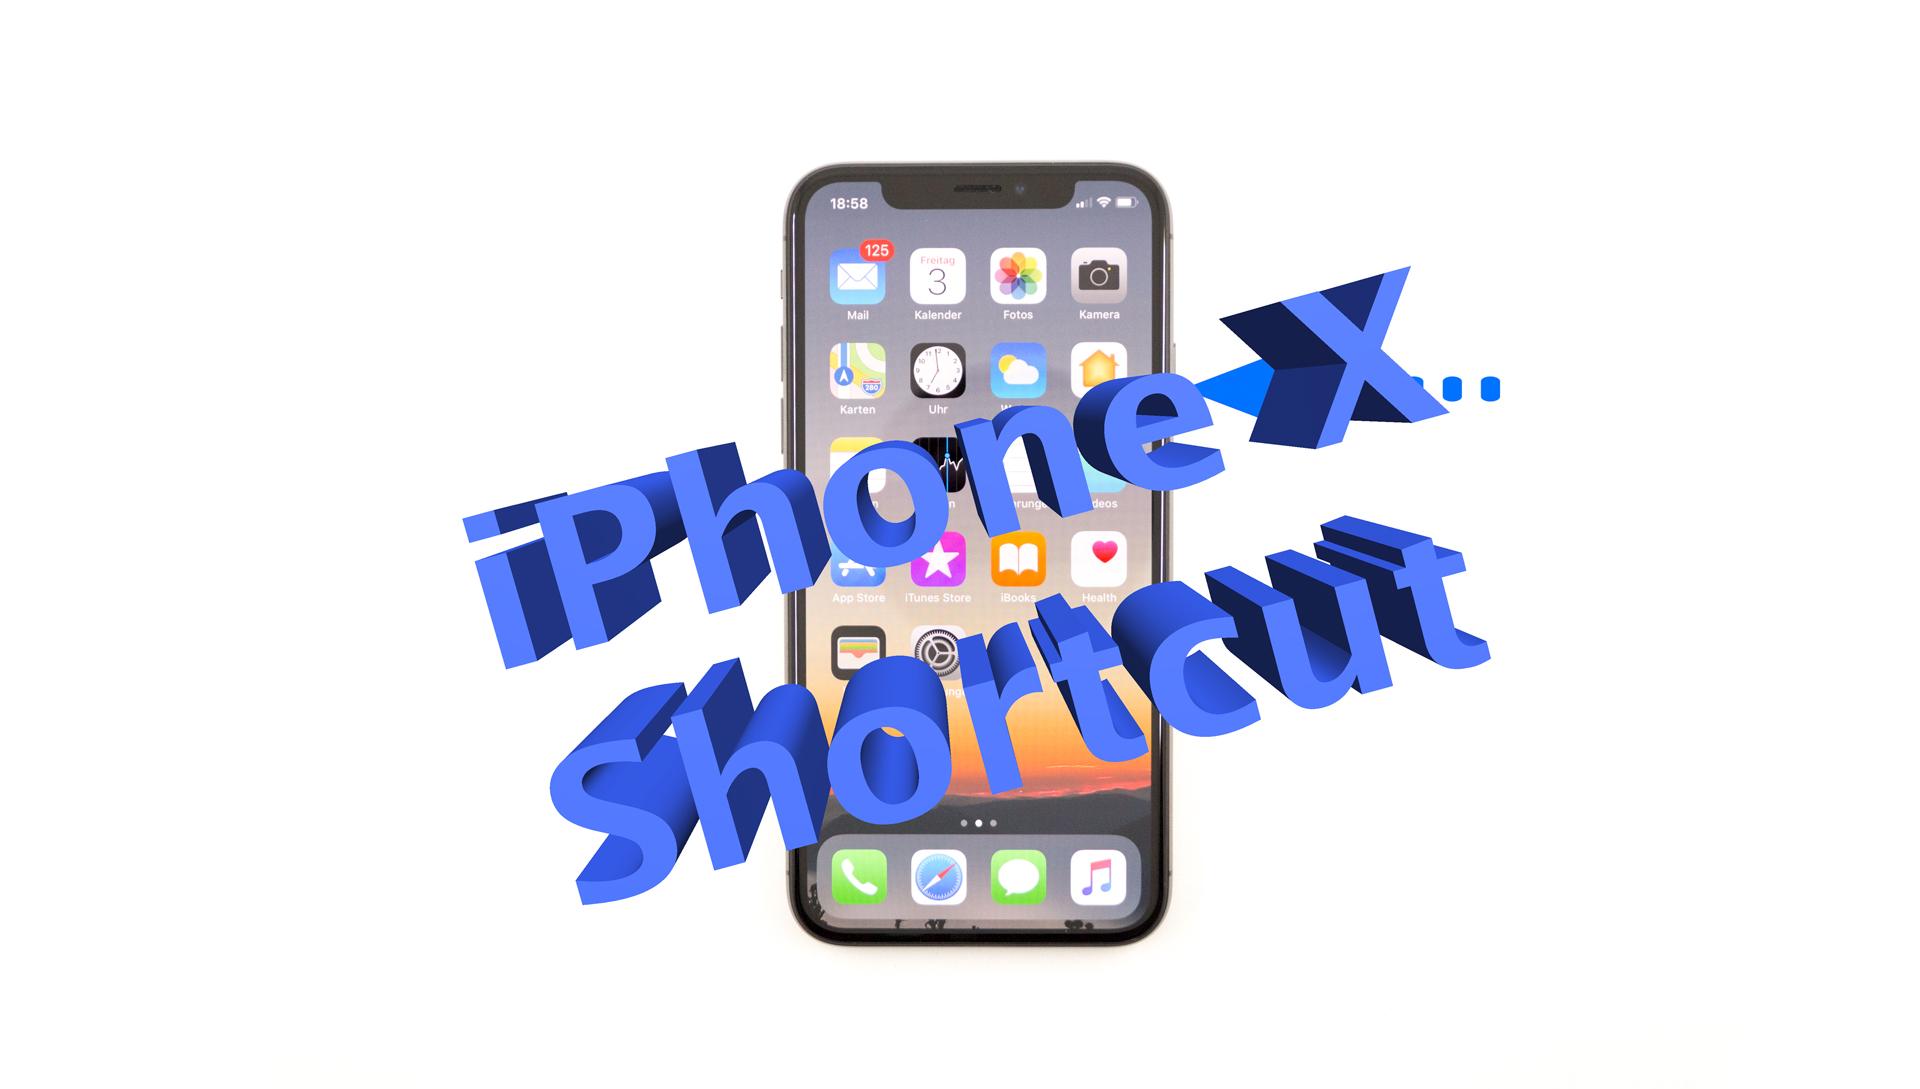 iphone x siri aufrufen